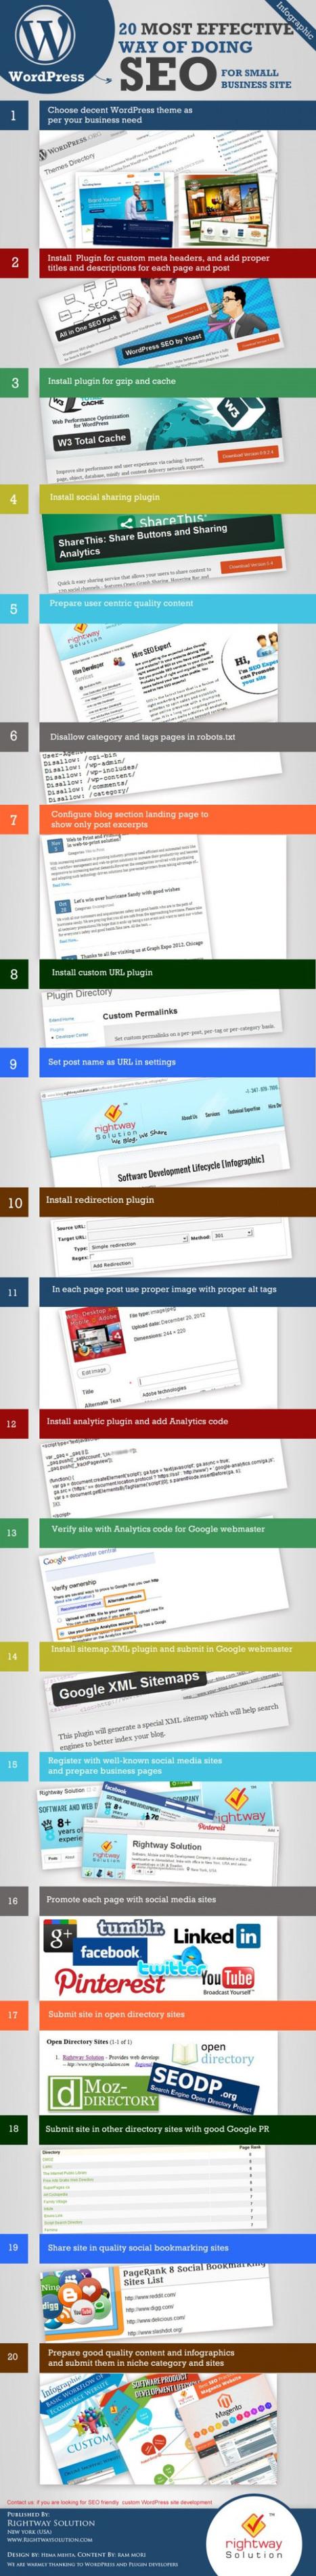 20 conseils SEO pour Wordpress | Veille Wordpress | Scoop.it